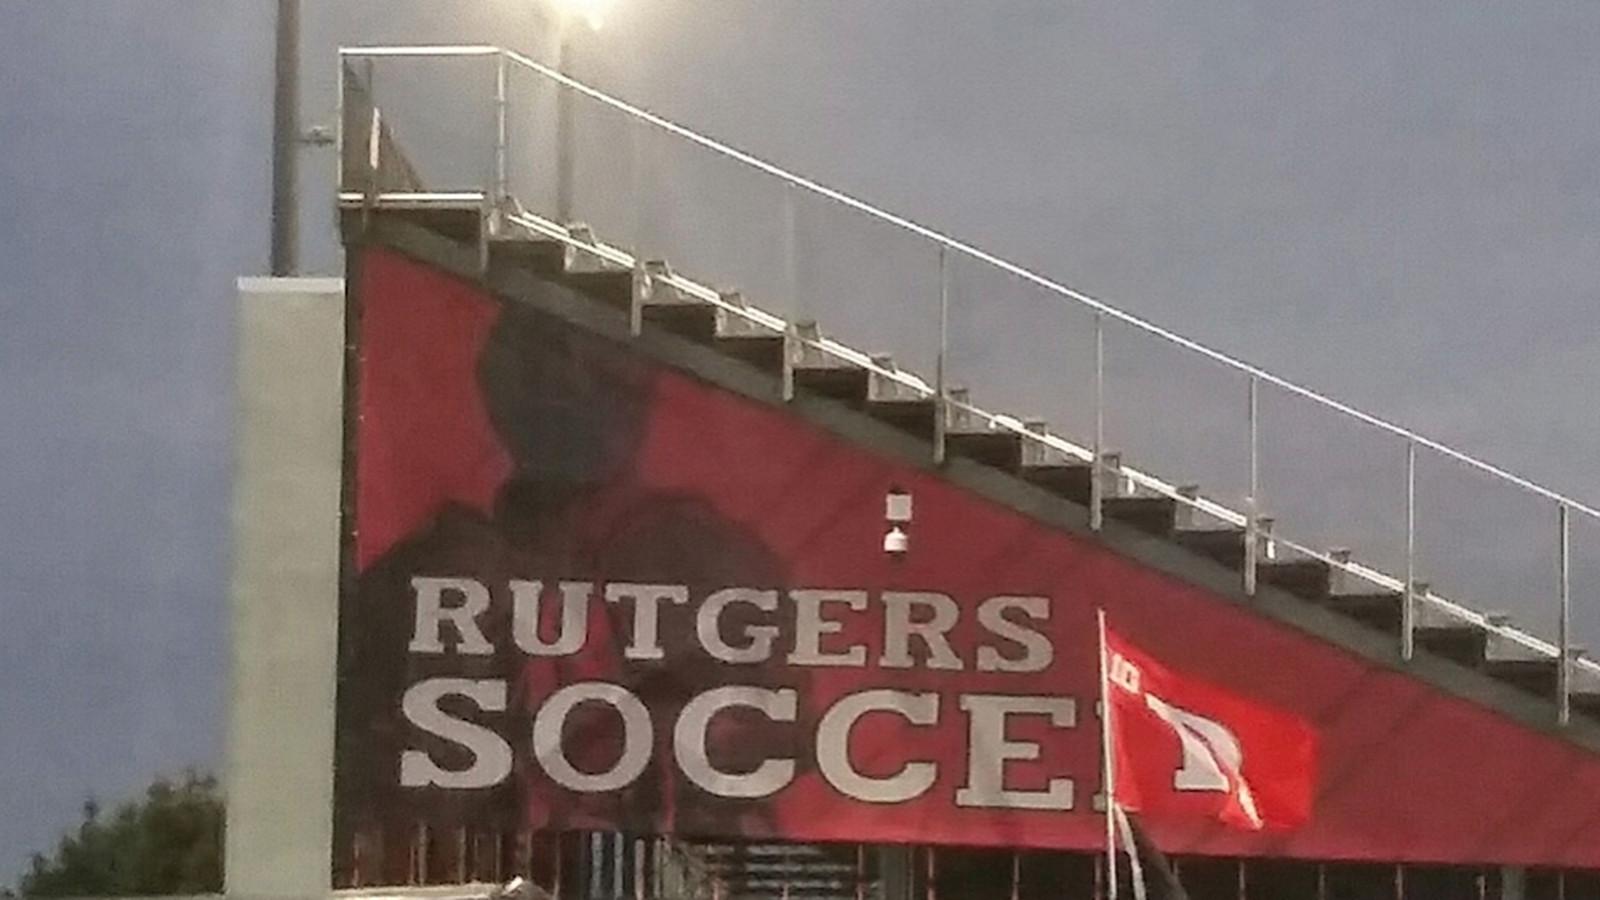 Rutgers_women_s_soccer_photo.0